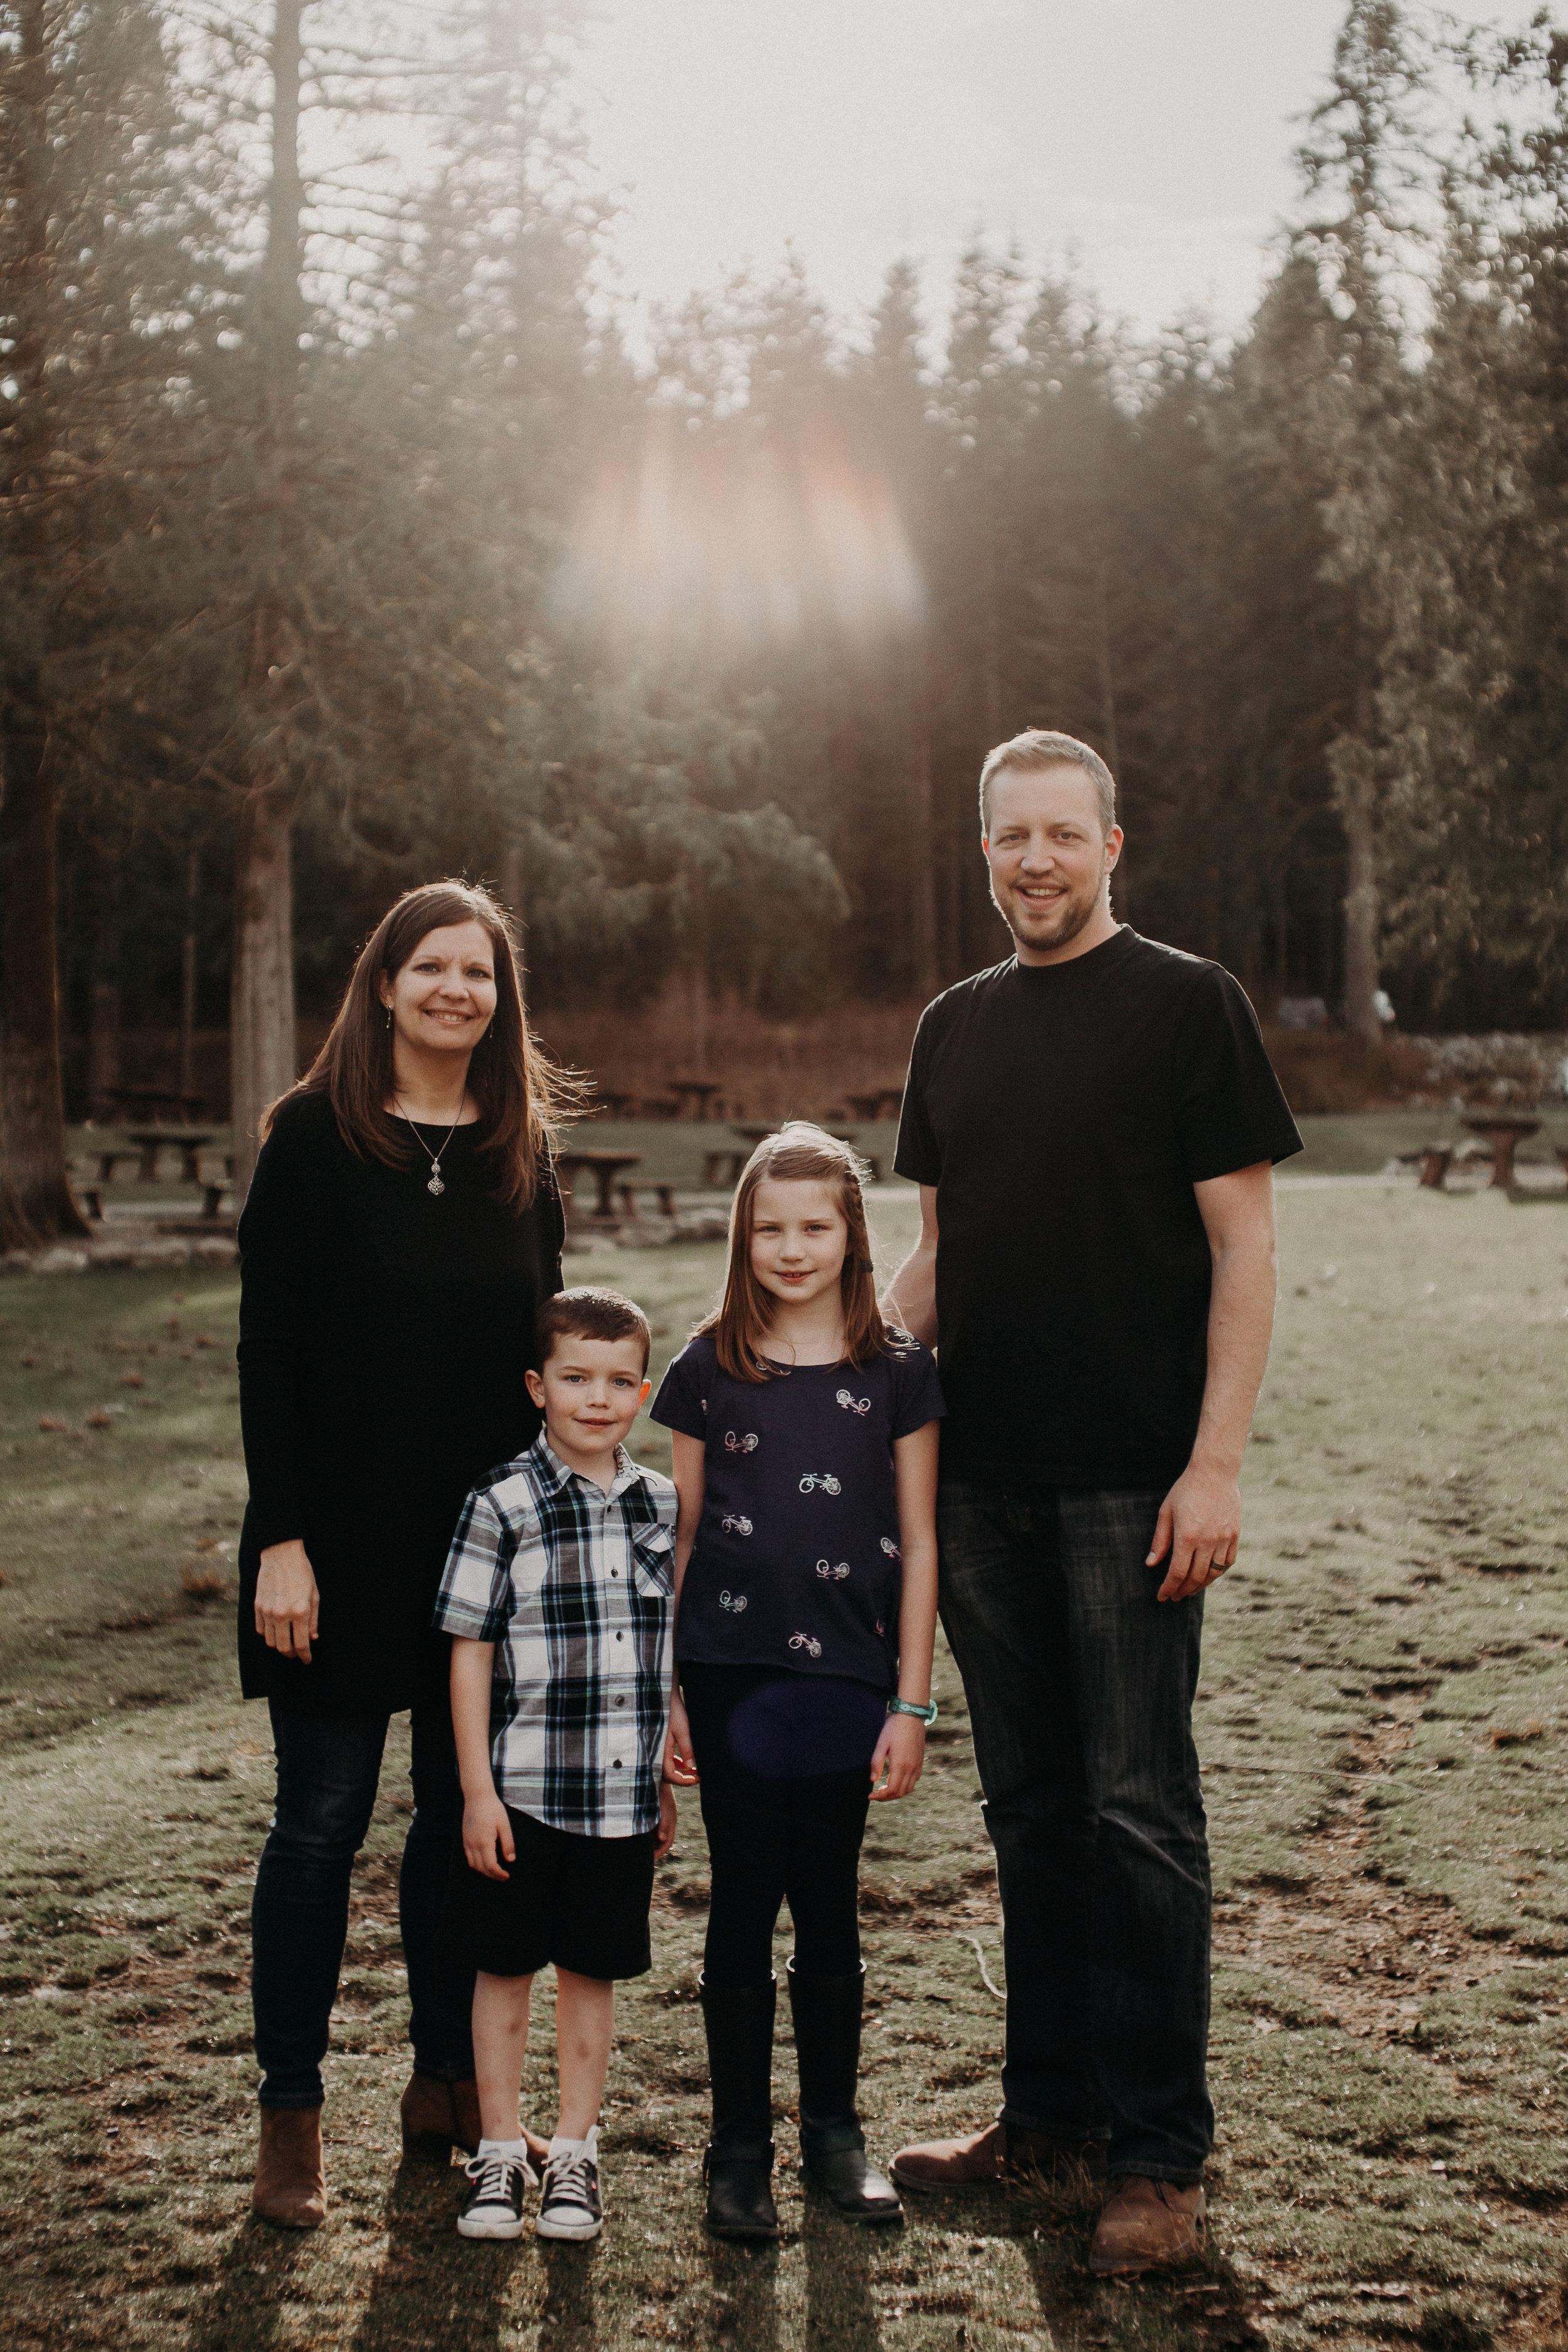 GYSBERS-FAMILY-9.jpg